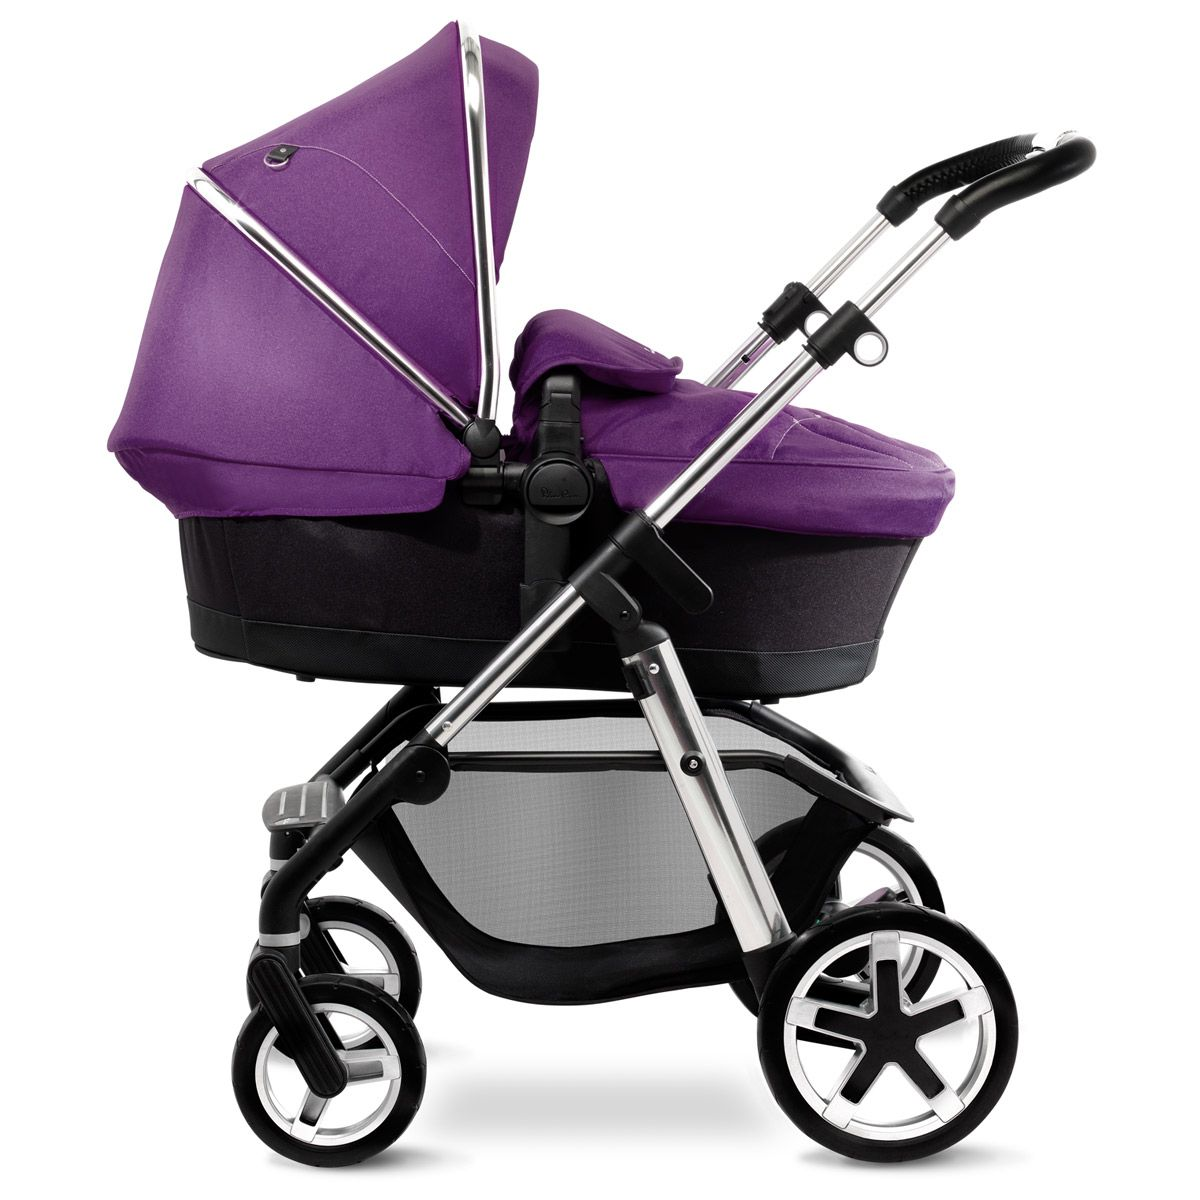 Damson Purple Pioneer Pram, Pushchair and Travel System